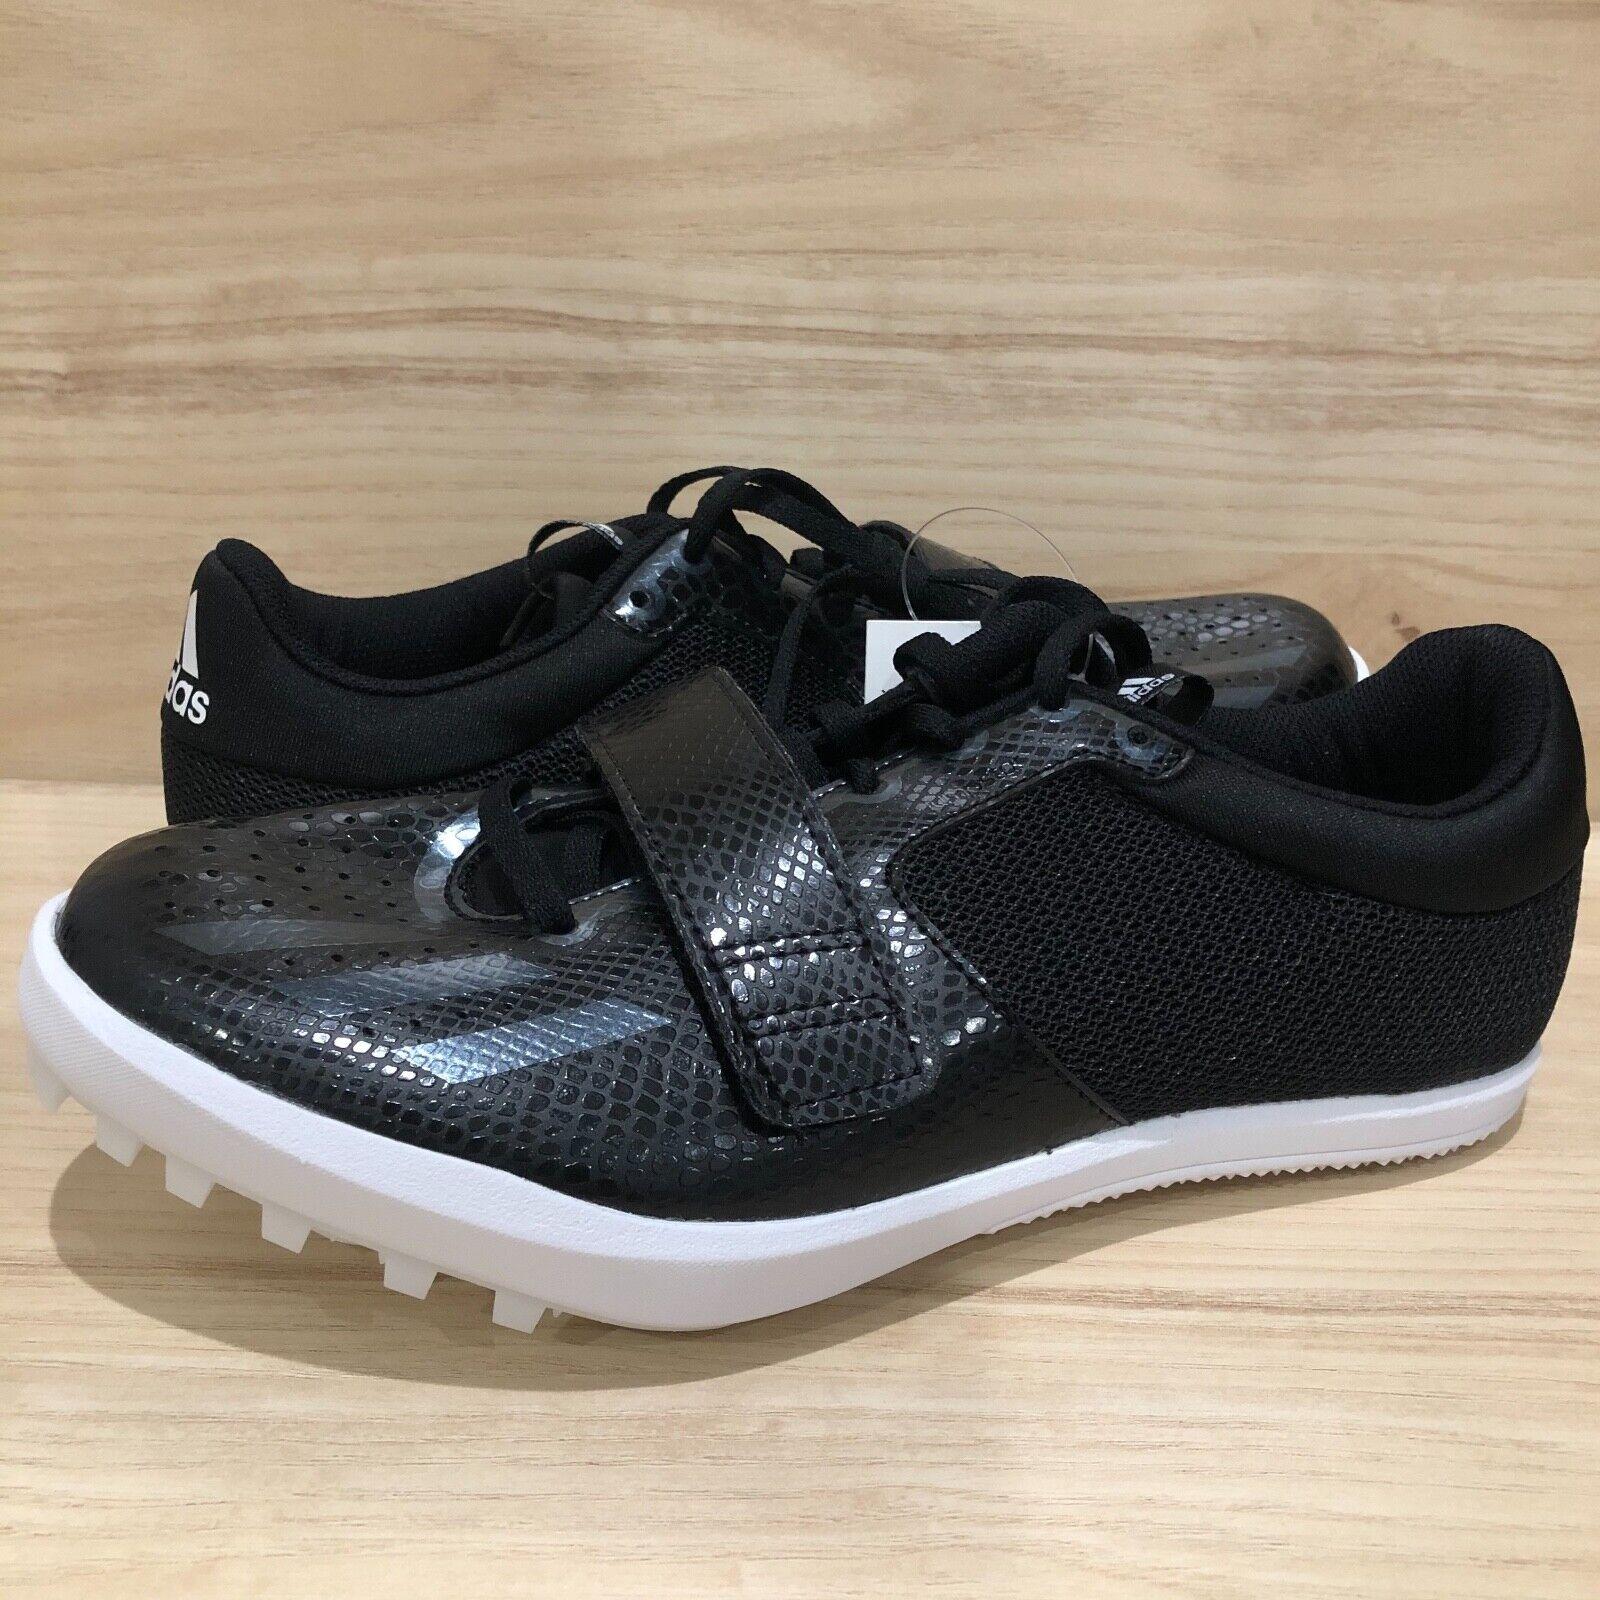 NEW Adidas Jumpstar Triple Long Shoe Black White Track Field B37500 Men Size 8